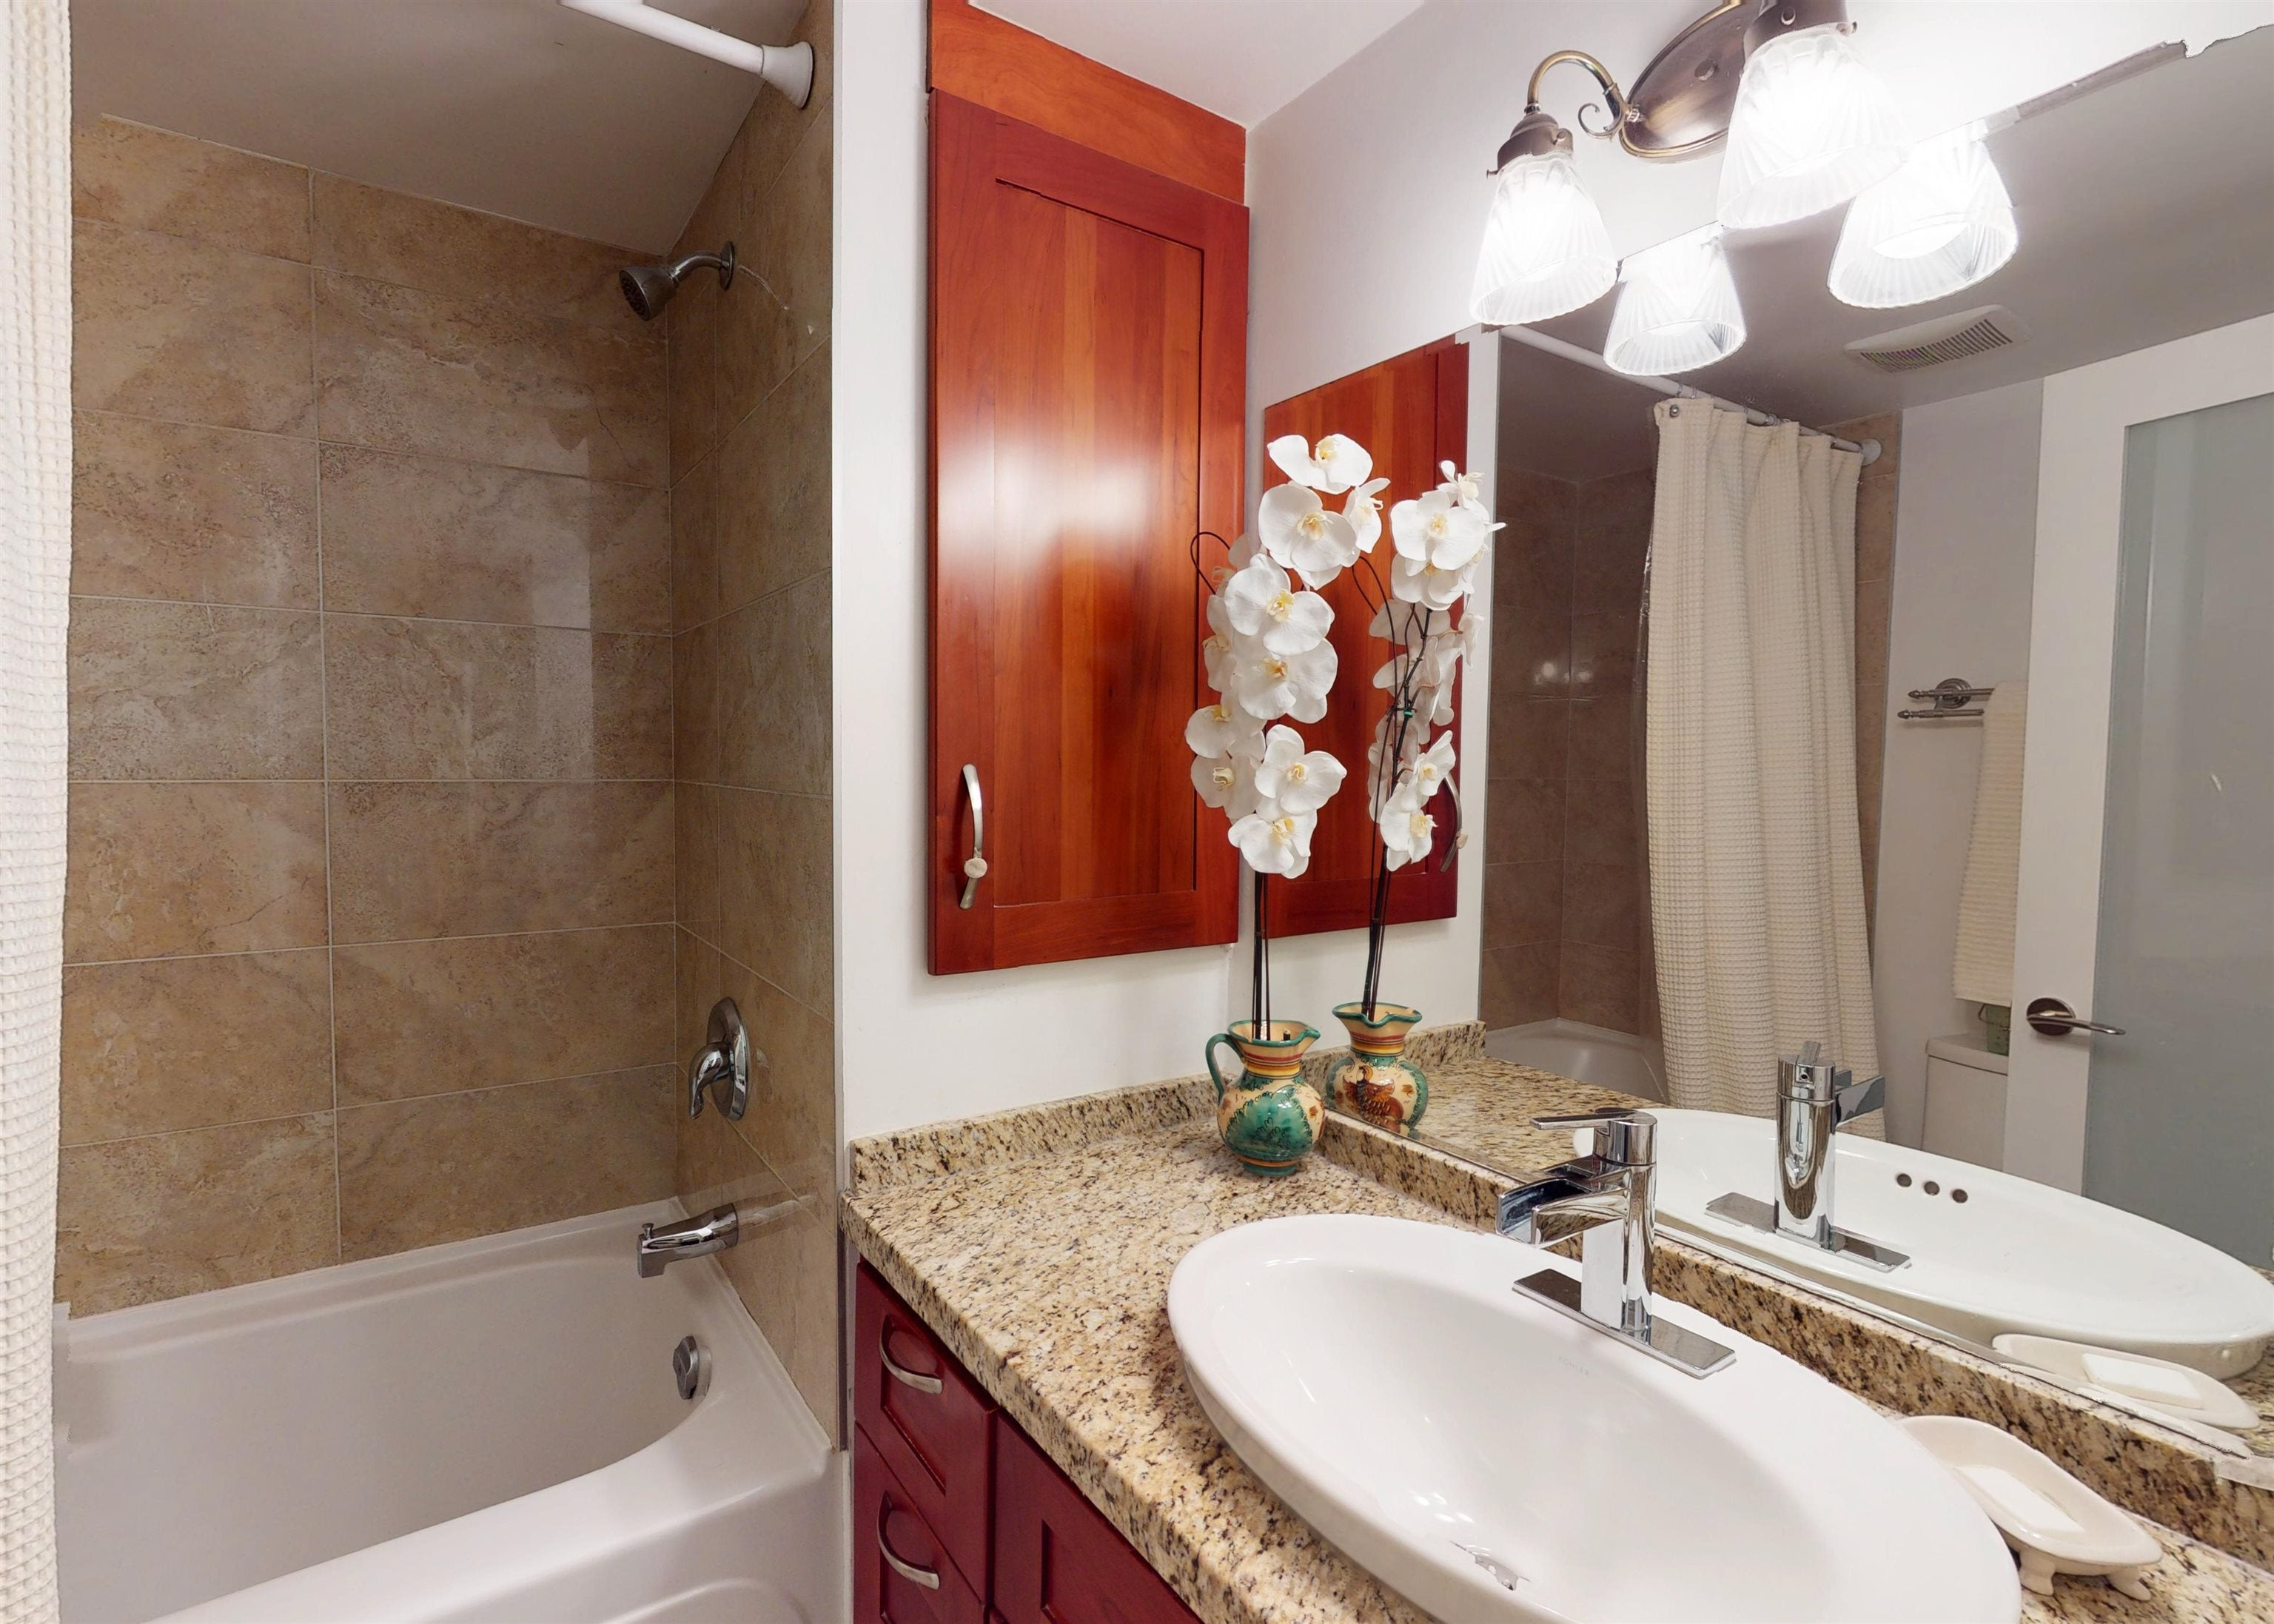 202 1750 ESQUIMALT AVENUE - Ambleside Apartment/Condo for sale, 1 Bedroom (R2610188) - #18